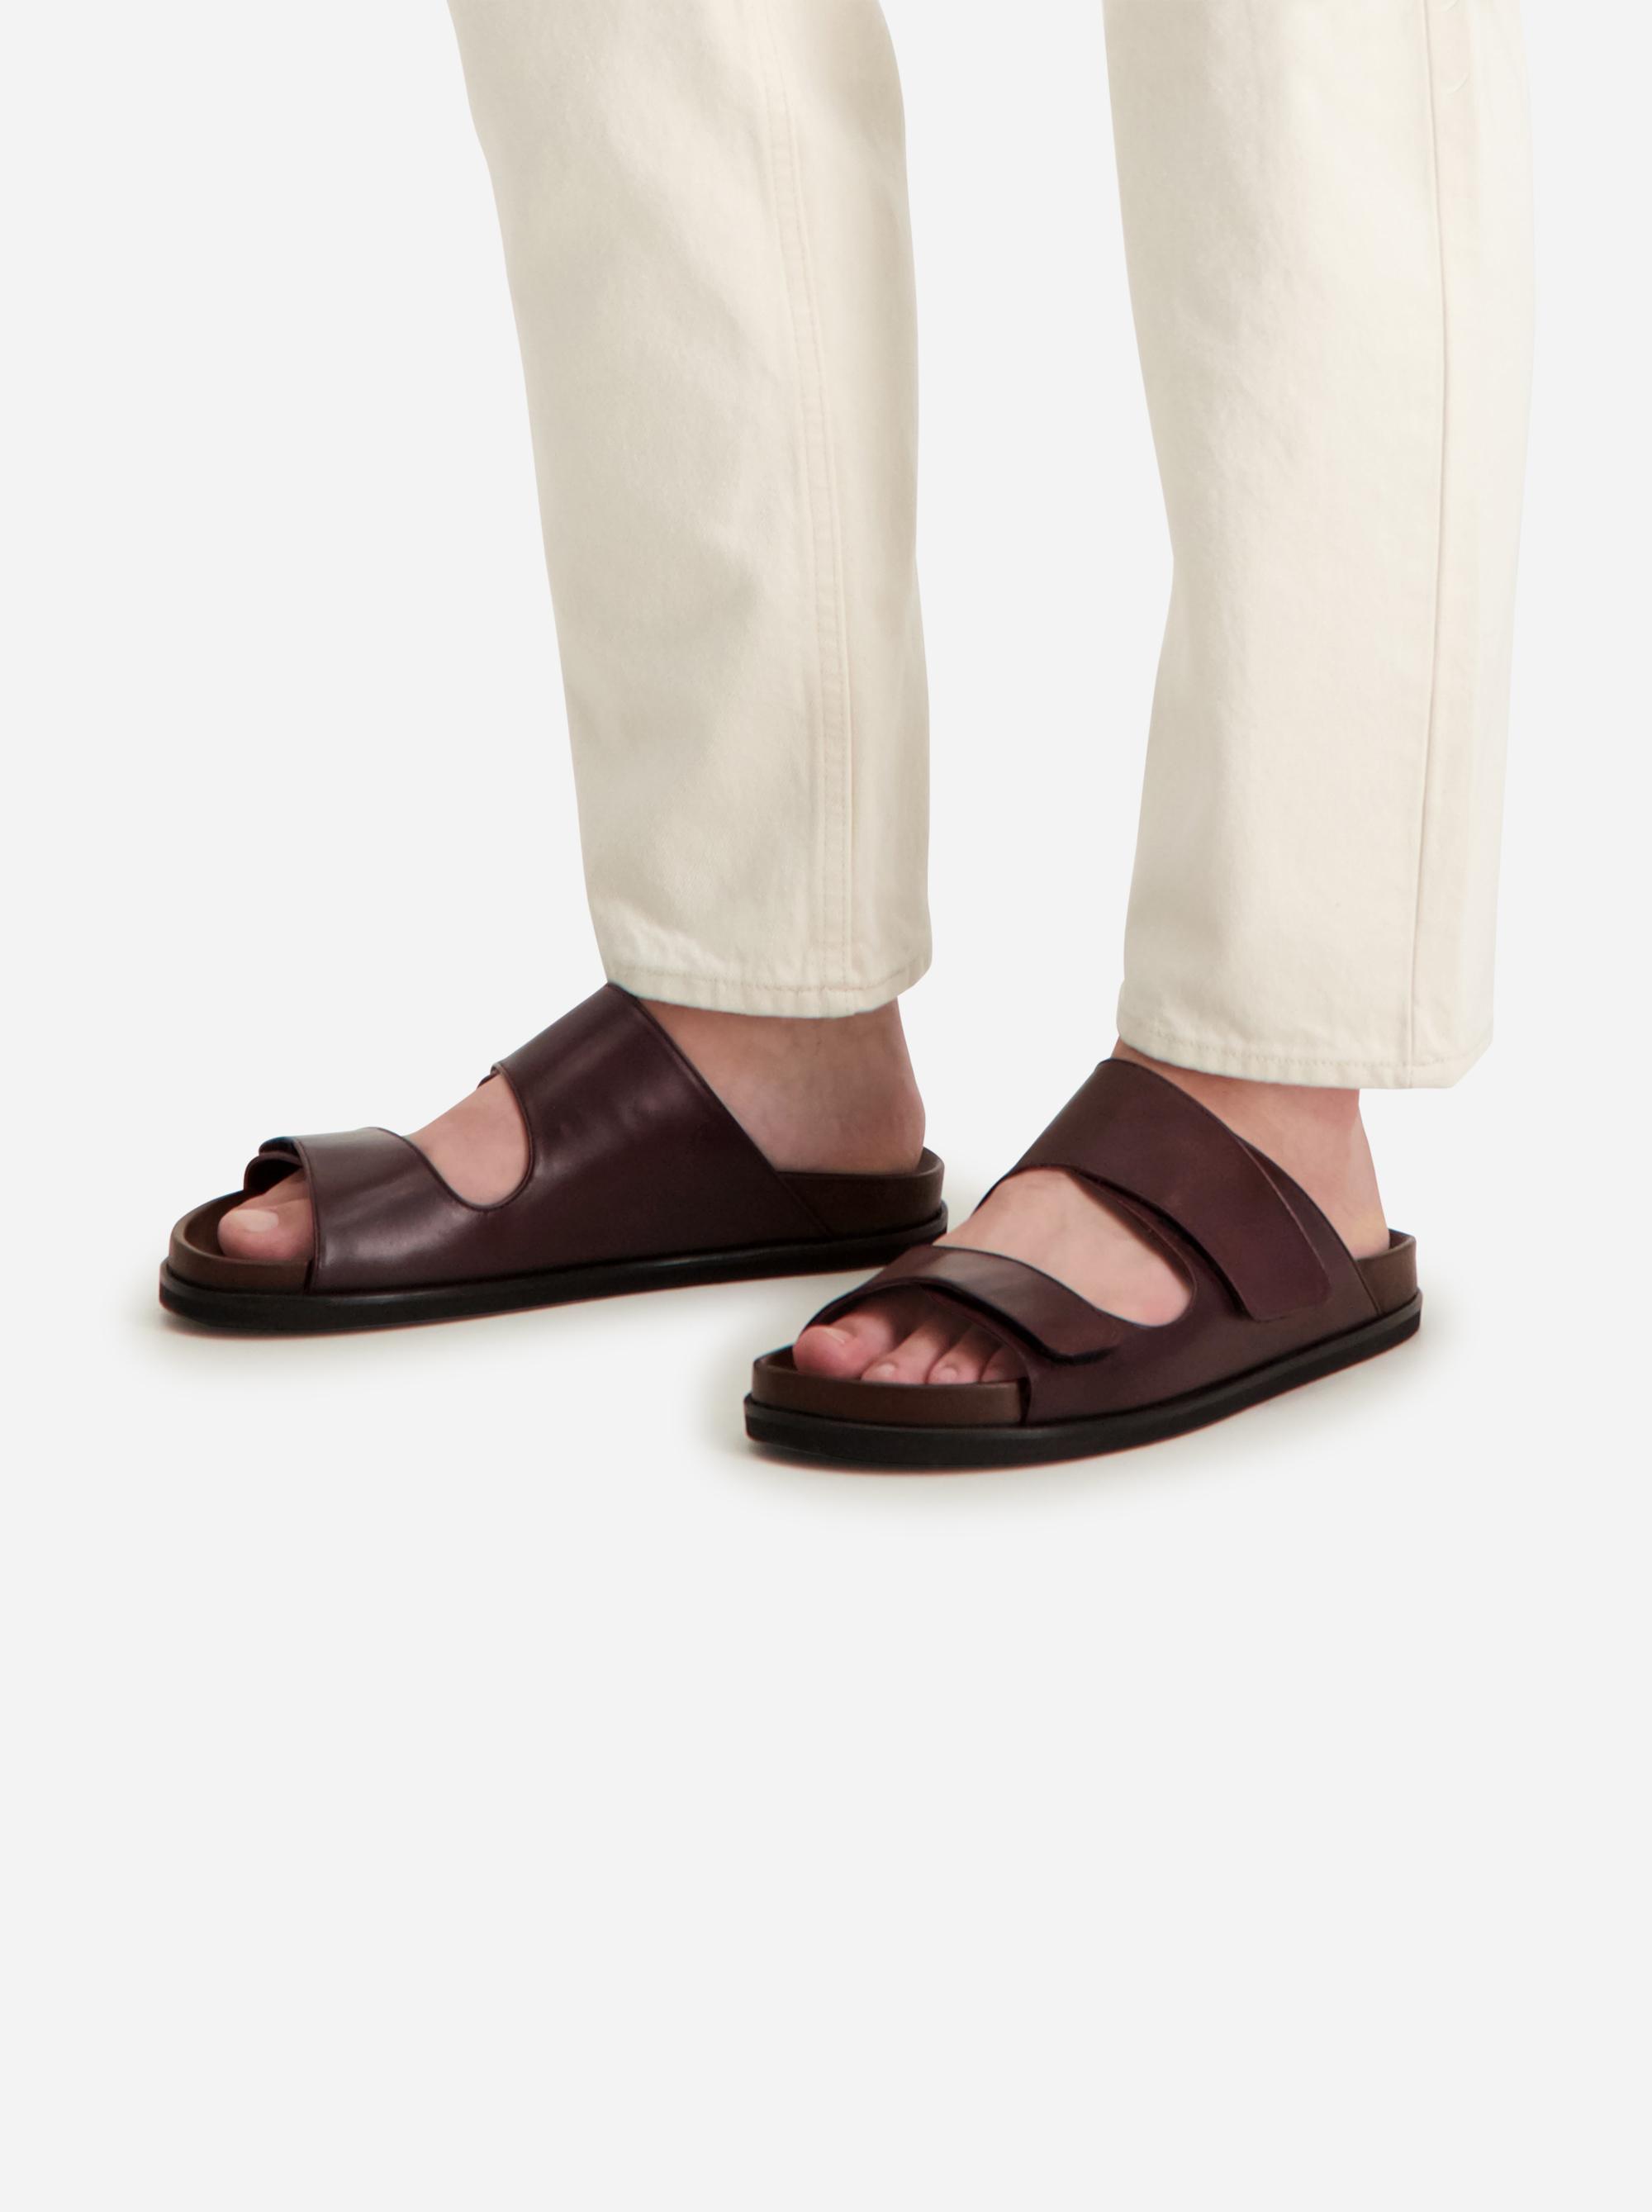 Teym - The Sandal - Burgundy - Men - 2